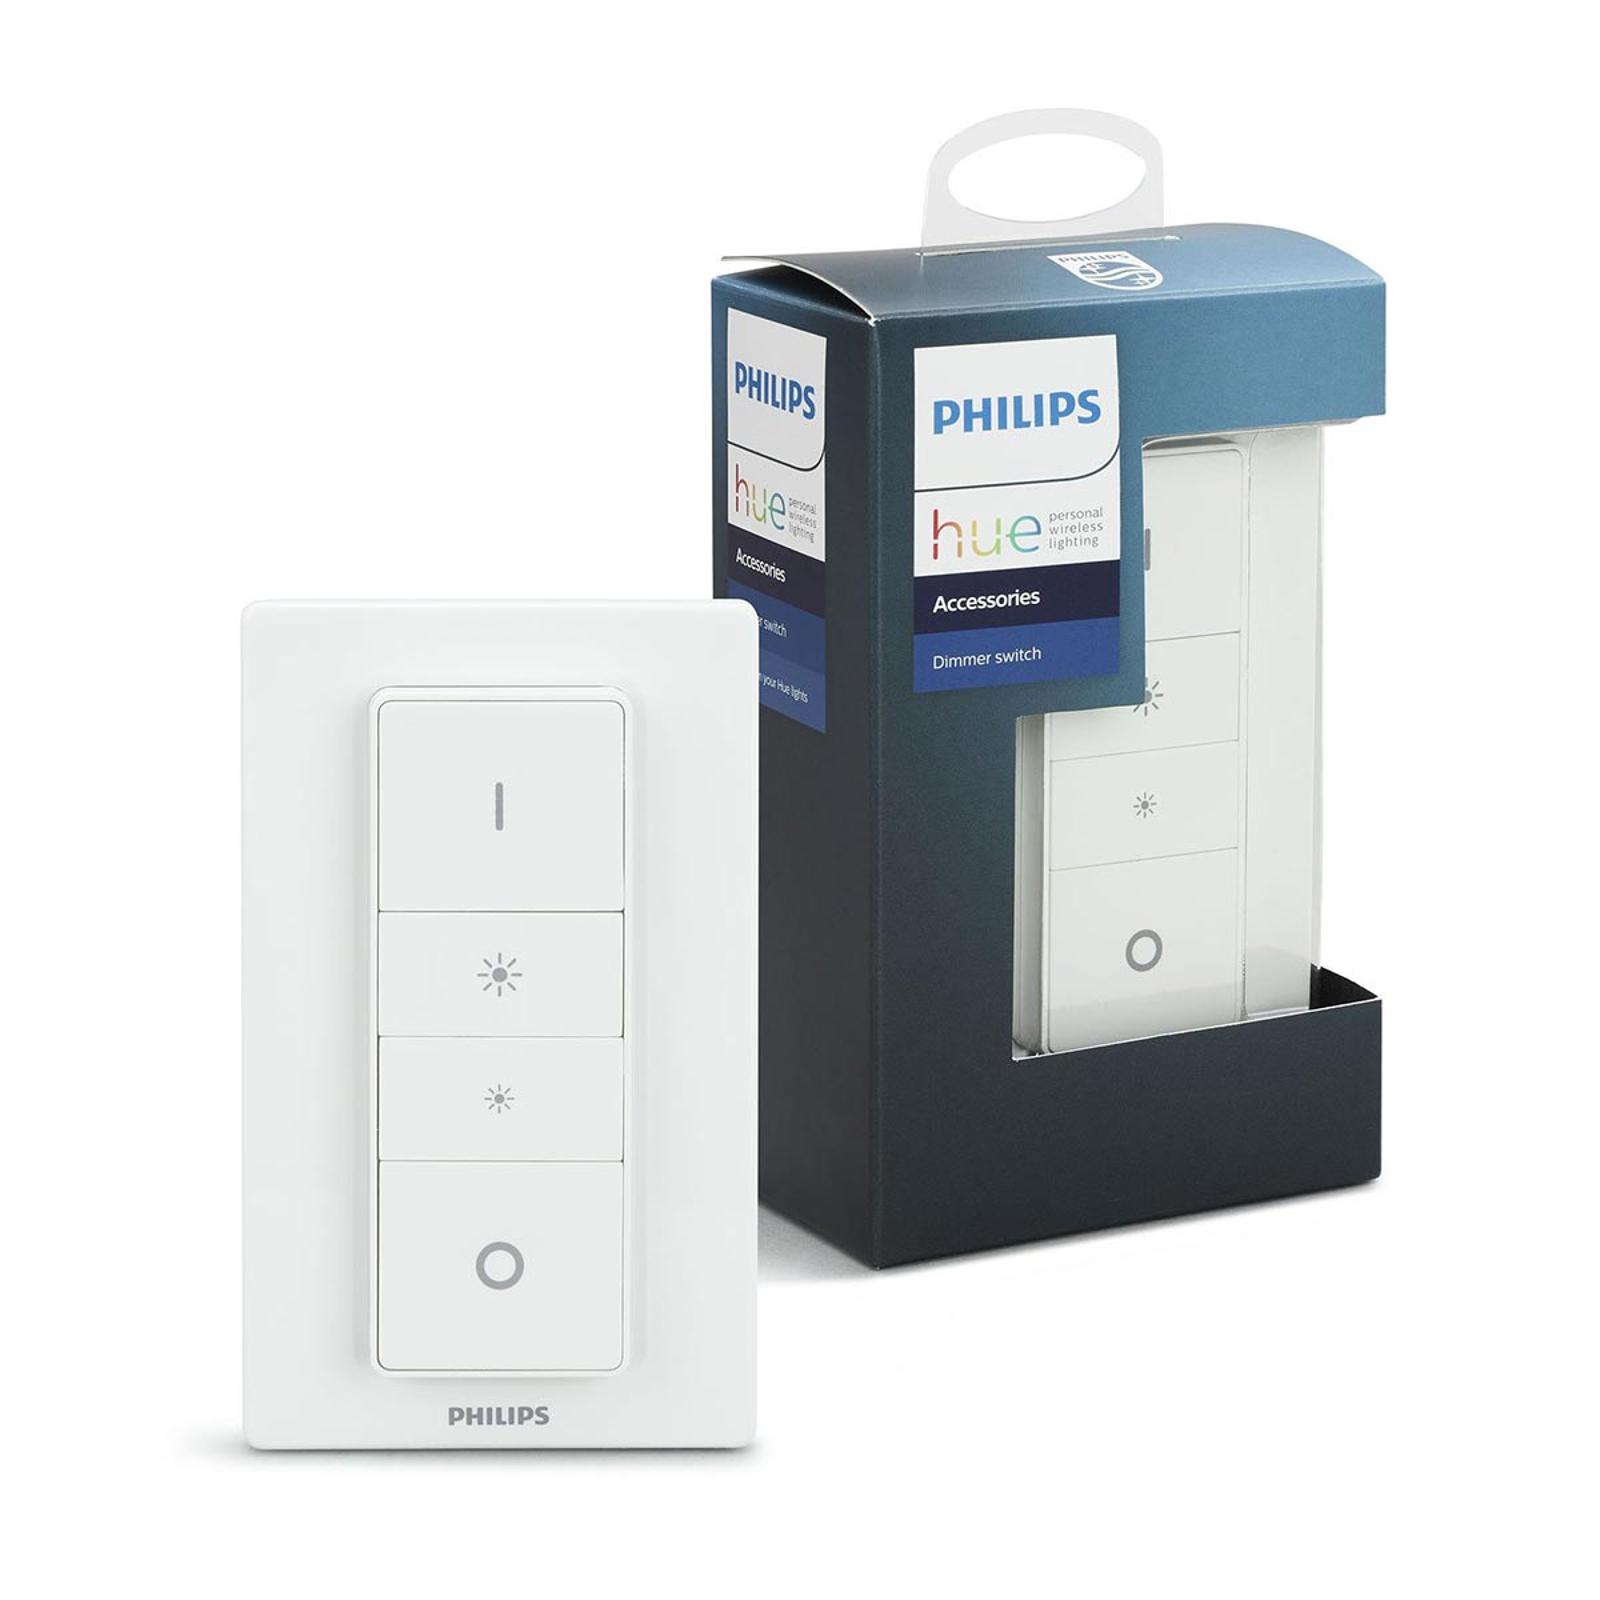 Philips Hue dimmer wireless